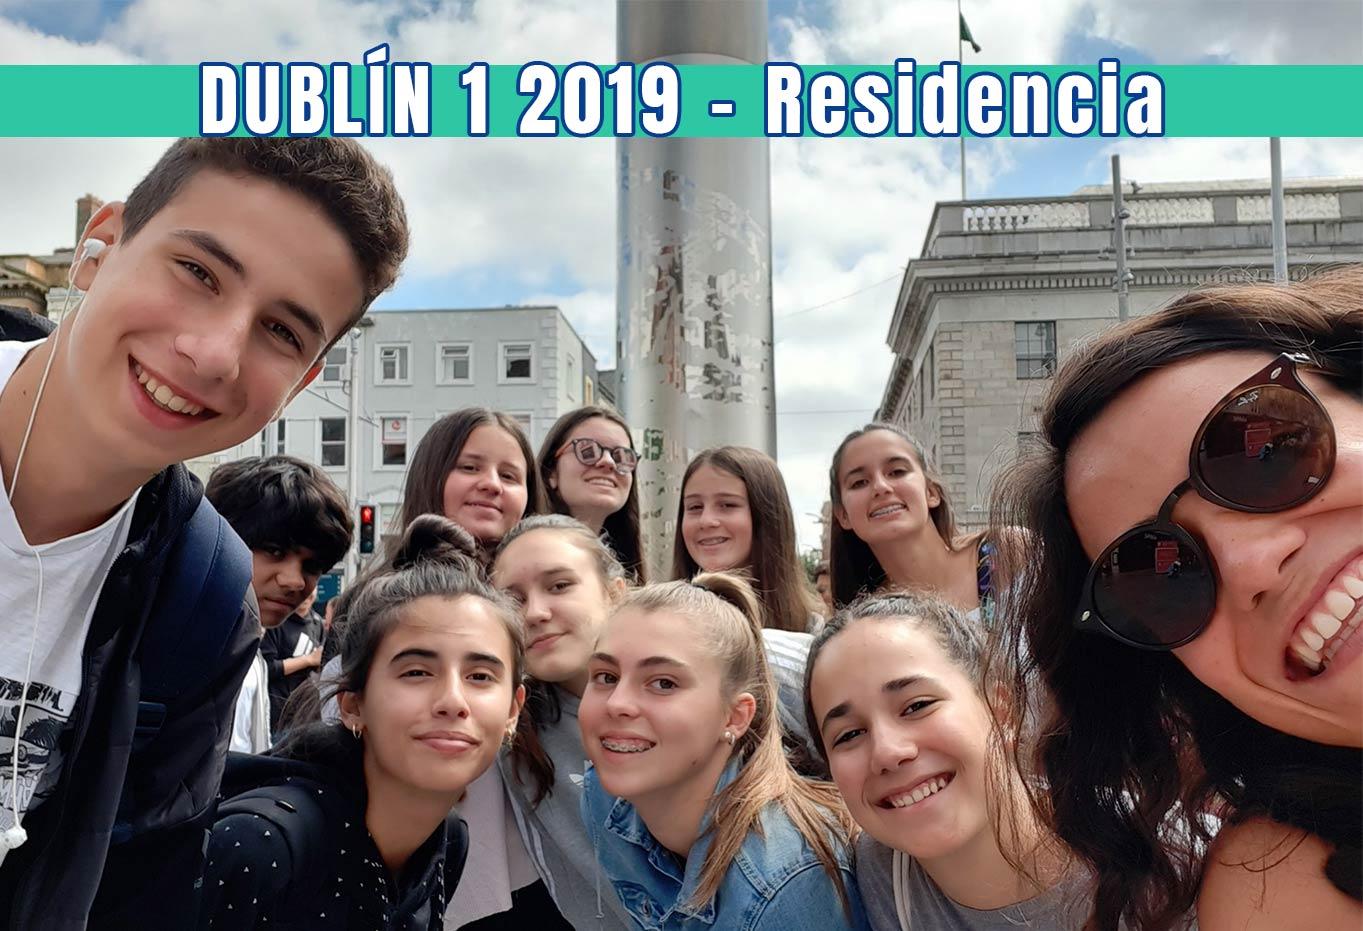 Program Review: DUBLÍN 1 – Residencia